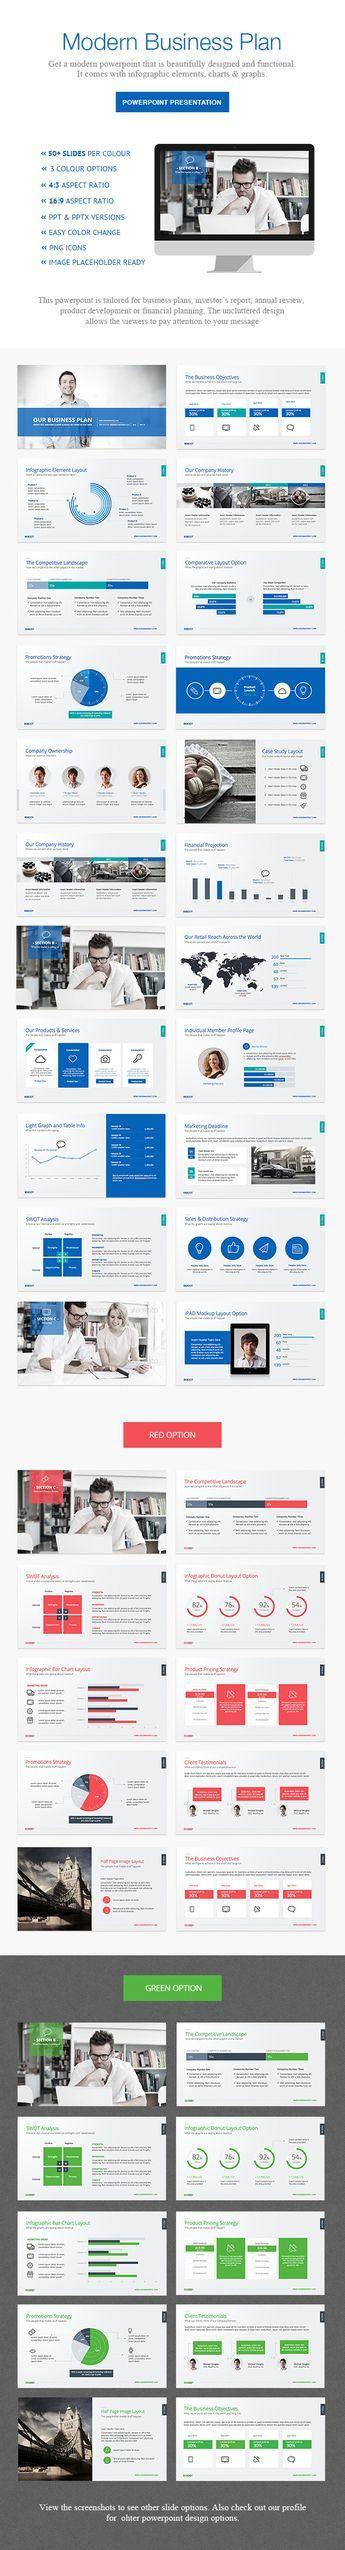 Business Plan Powerpoint PowerPoint Template / Theme / Presentation / Slides / Background / Power Point #powerpoint #template #theme